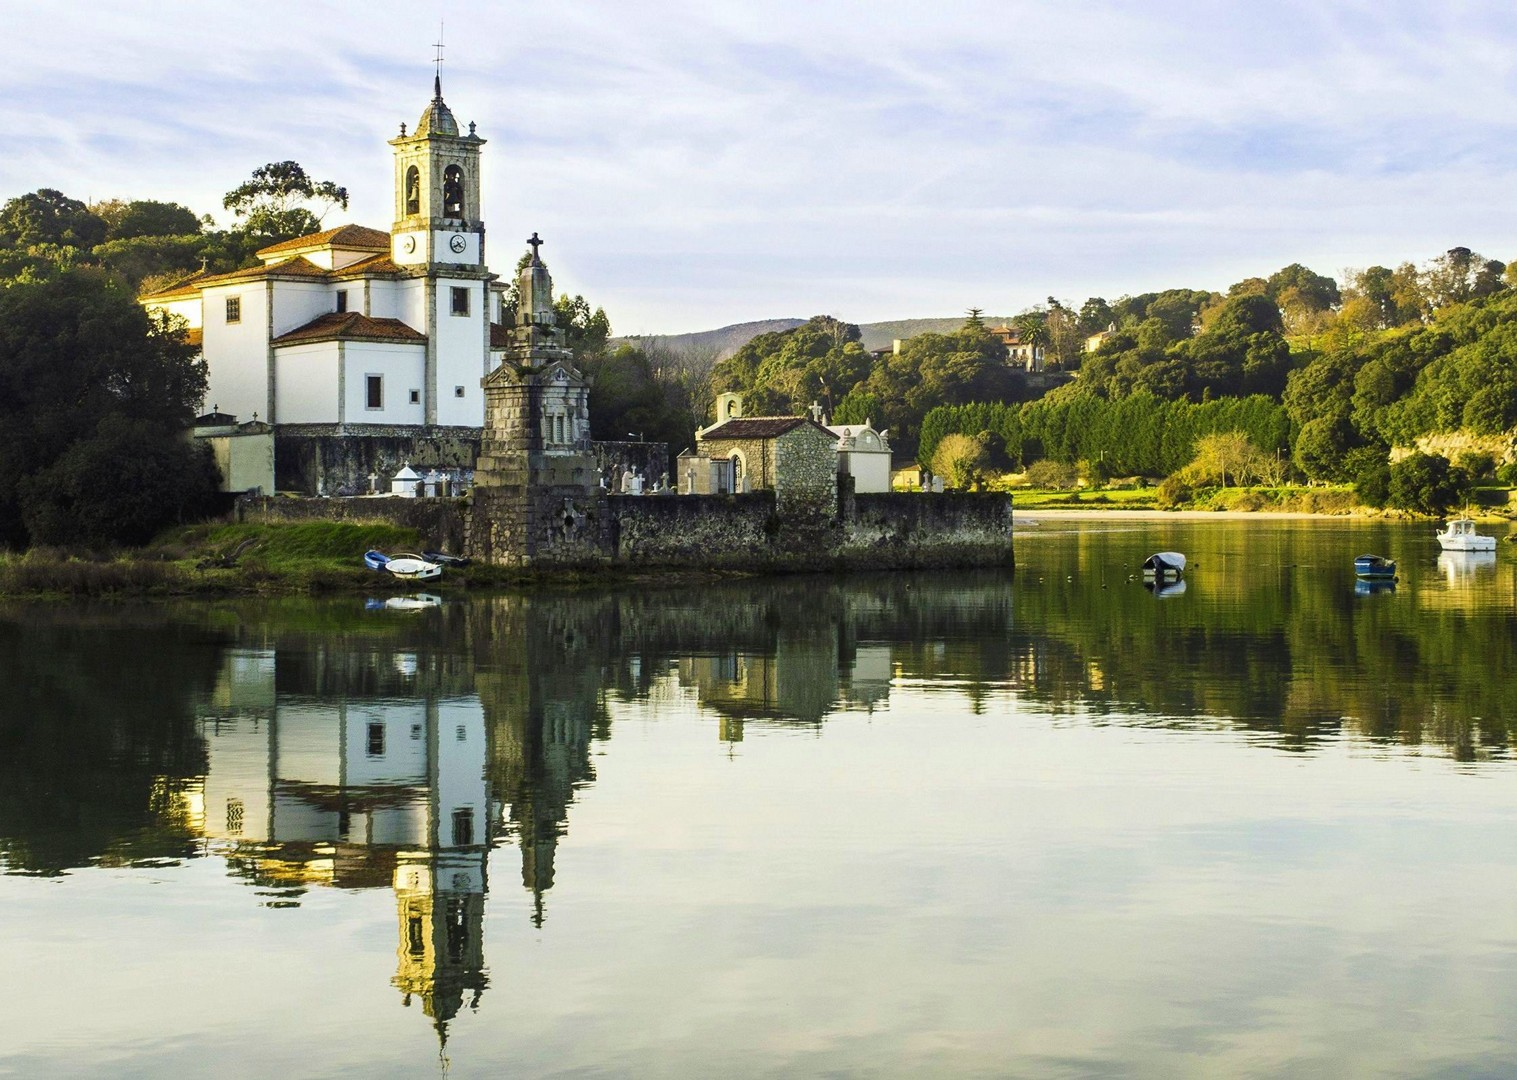 _Holiday.616.13996.jpg - Spain - Asturian Coastal Ride - Guided Family Cycling Holiday - Family Cycling